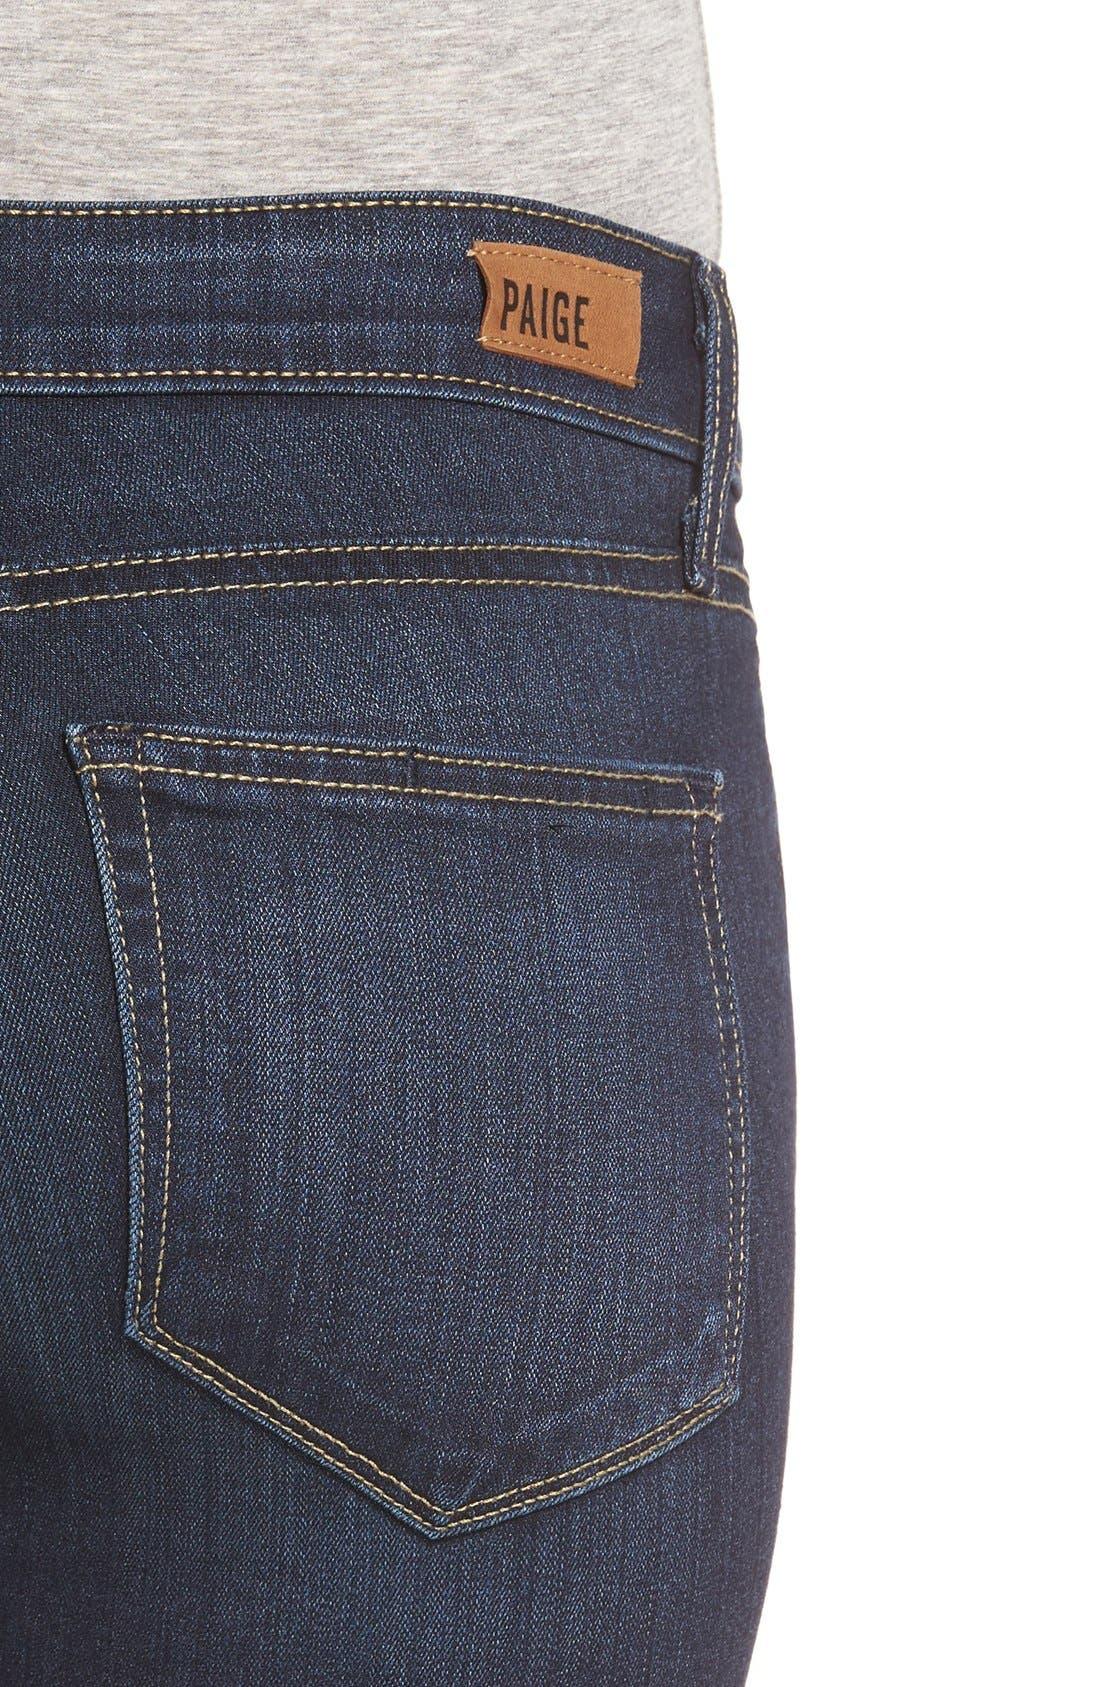 Transcend - Verdugo Ankle Ultra Skinny Jeans,                             Alternate thumbnail 5, color,                             Hartmann